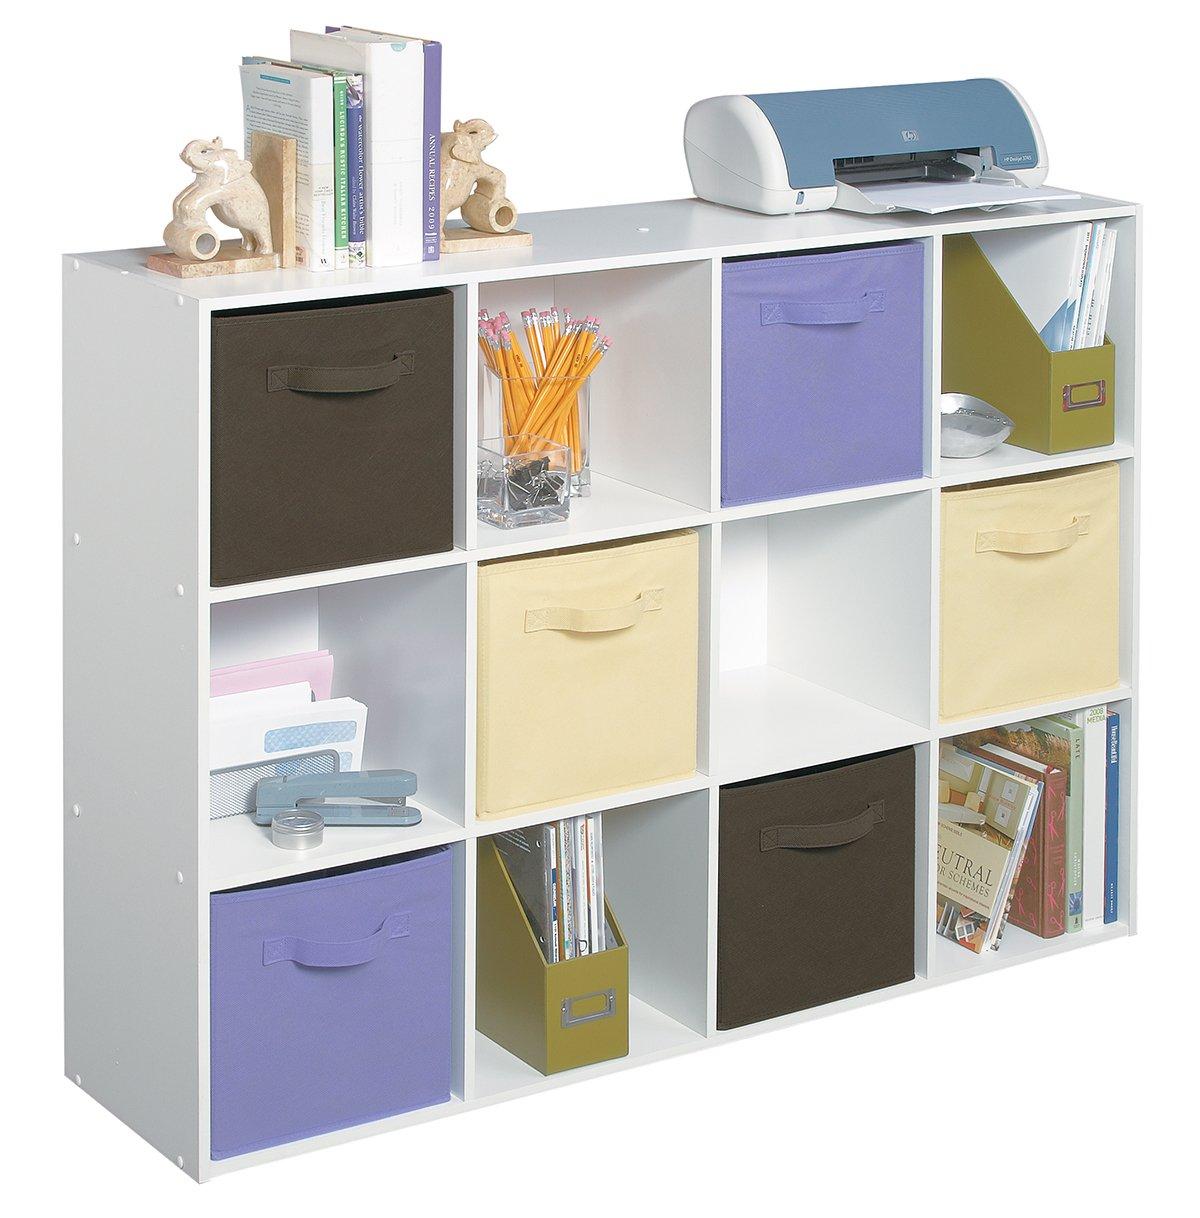 2 Set ClosetMaid 9-Cube Organizer White